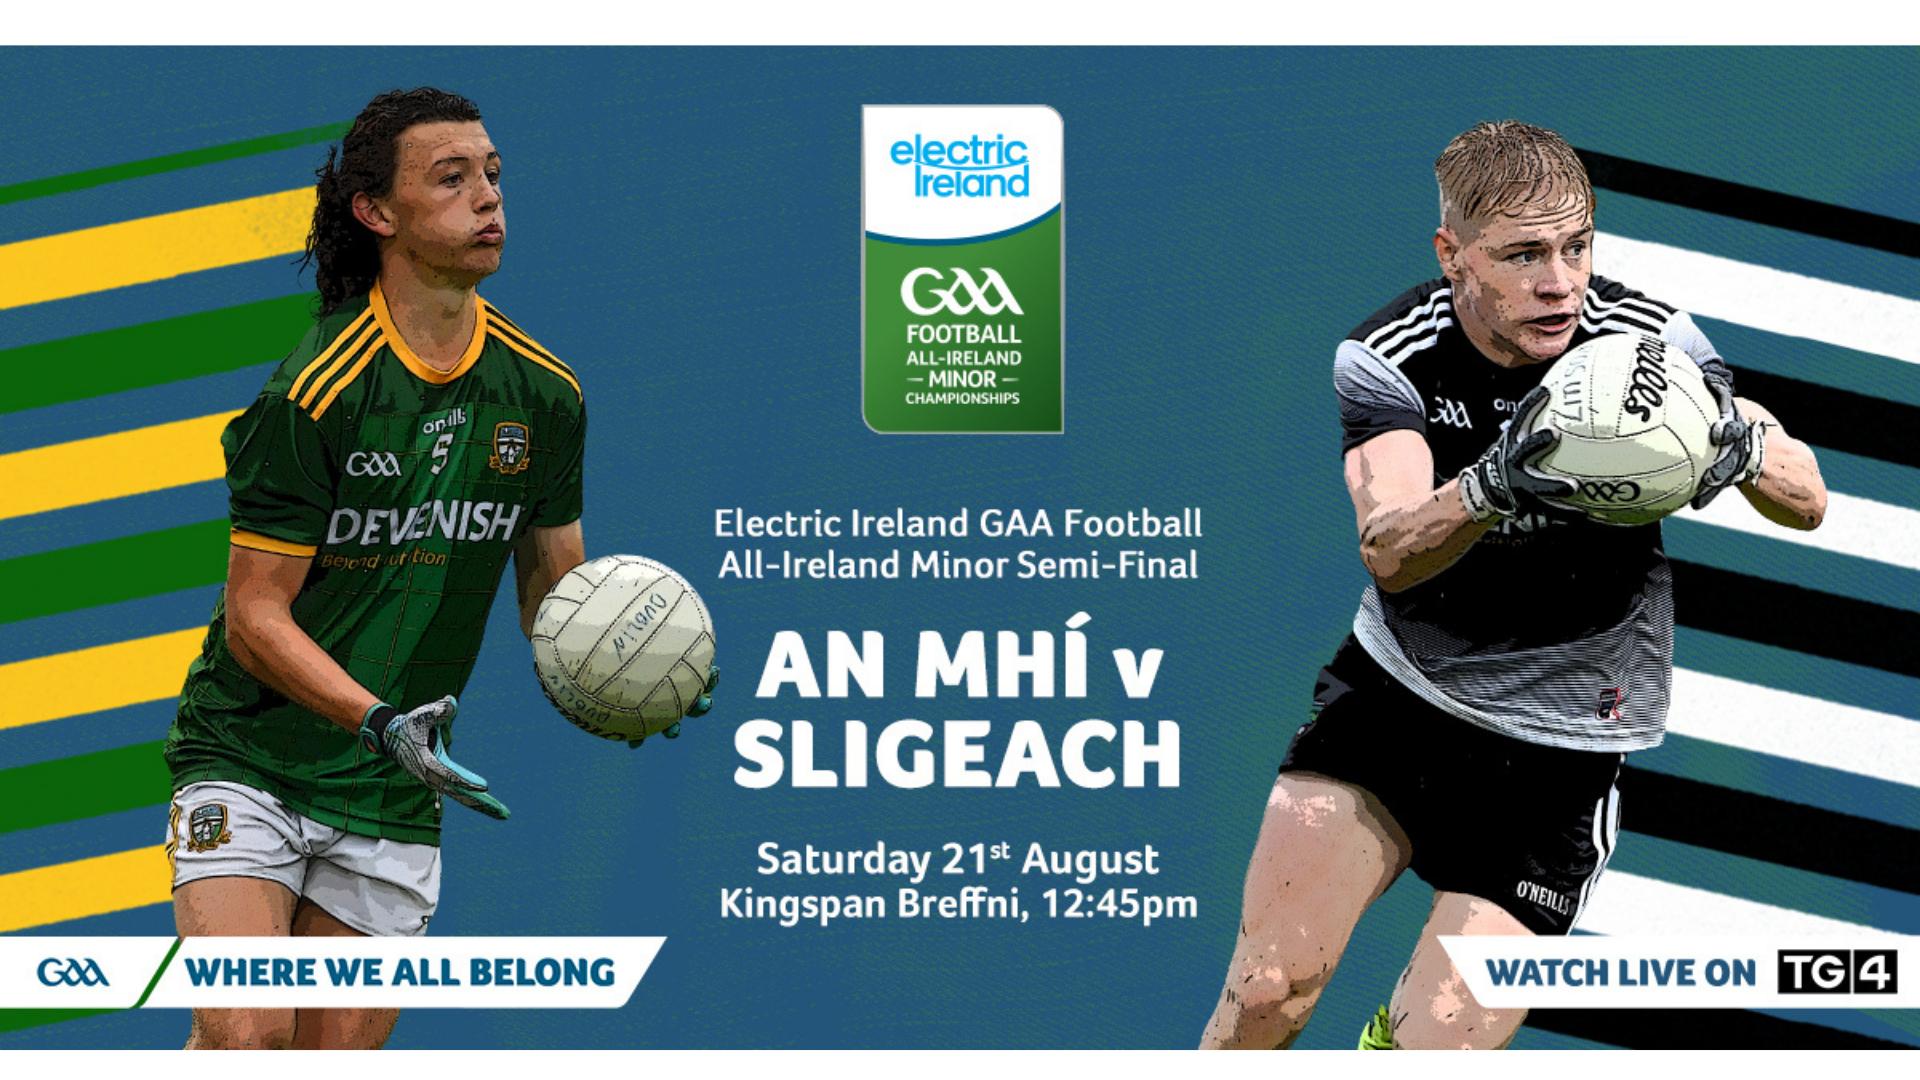 Tickets – Electric Ireland GAA Football All-Ireland Minor Semi-Final